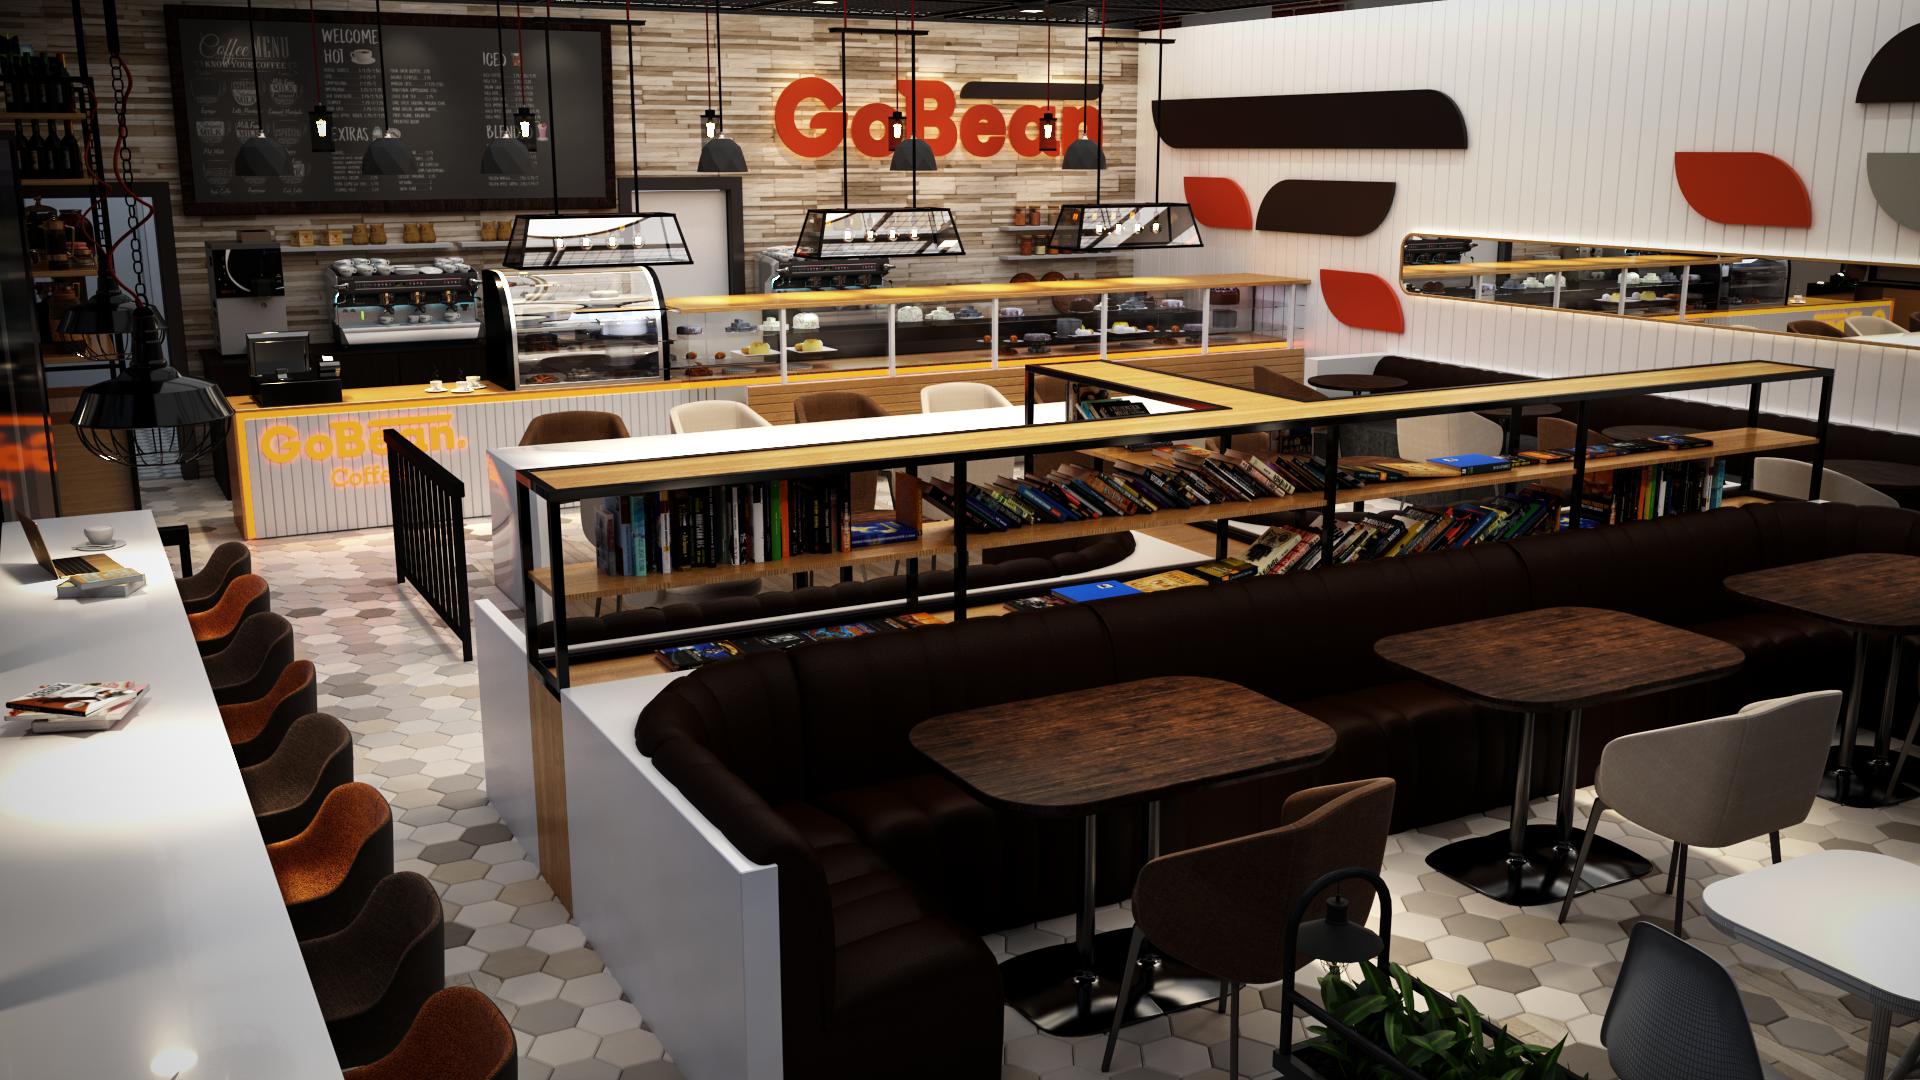 Cafe Design تصميم كافية Home Decor Conference Room Table Decor